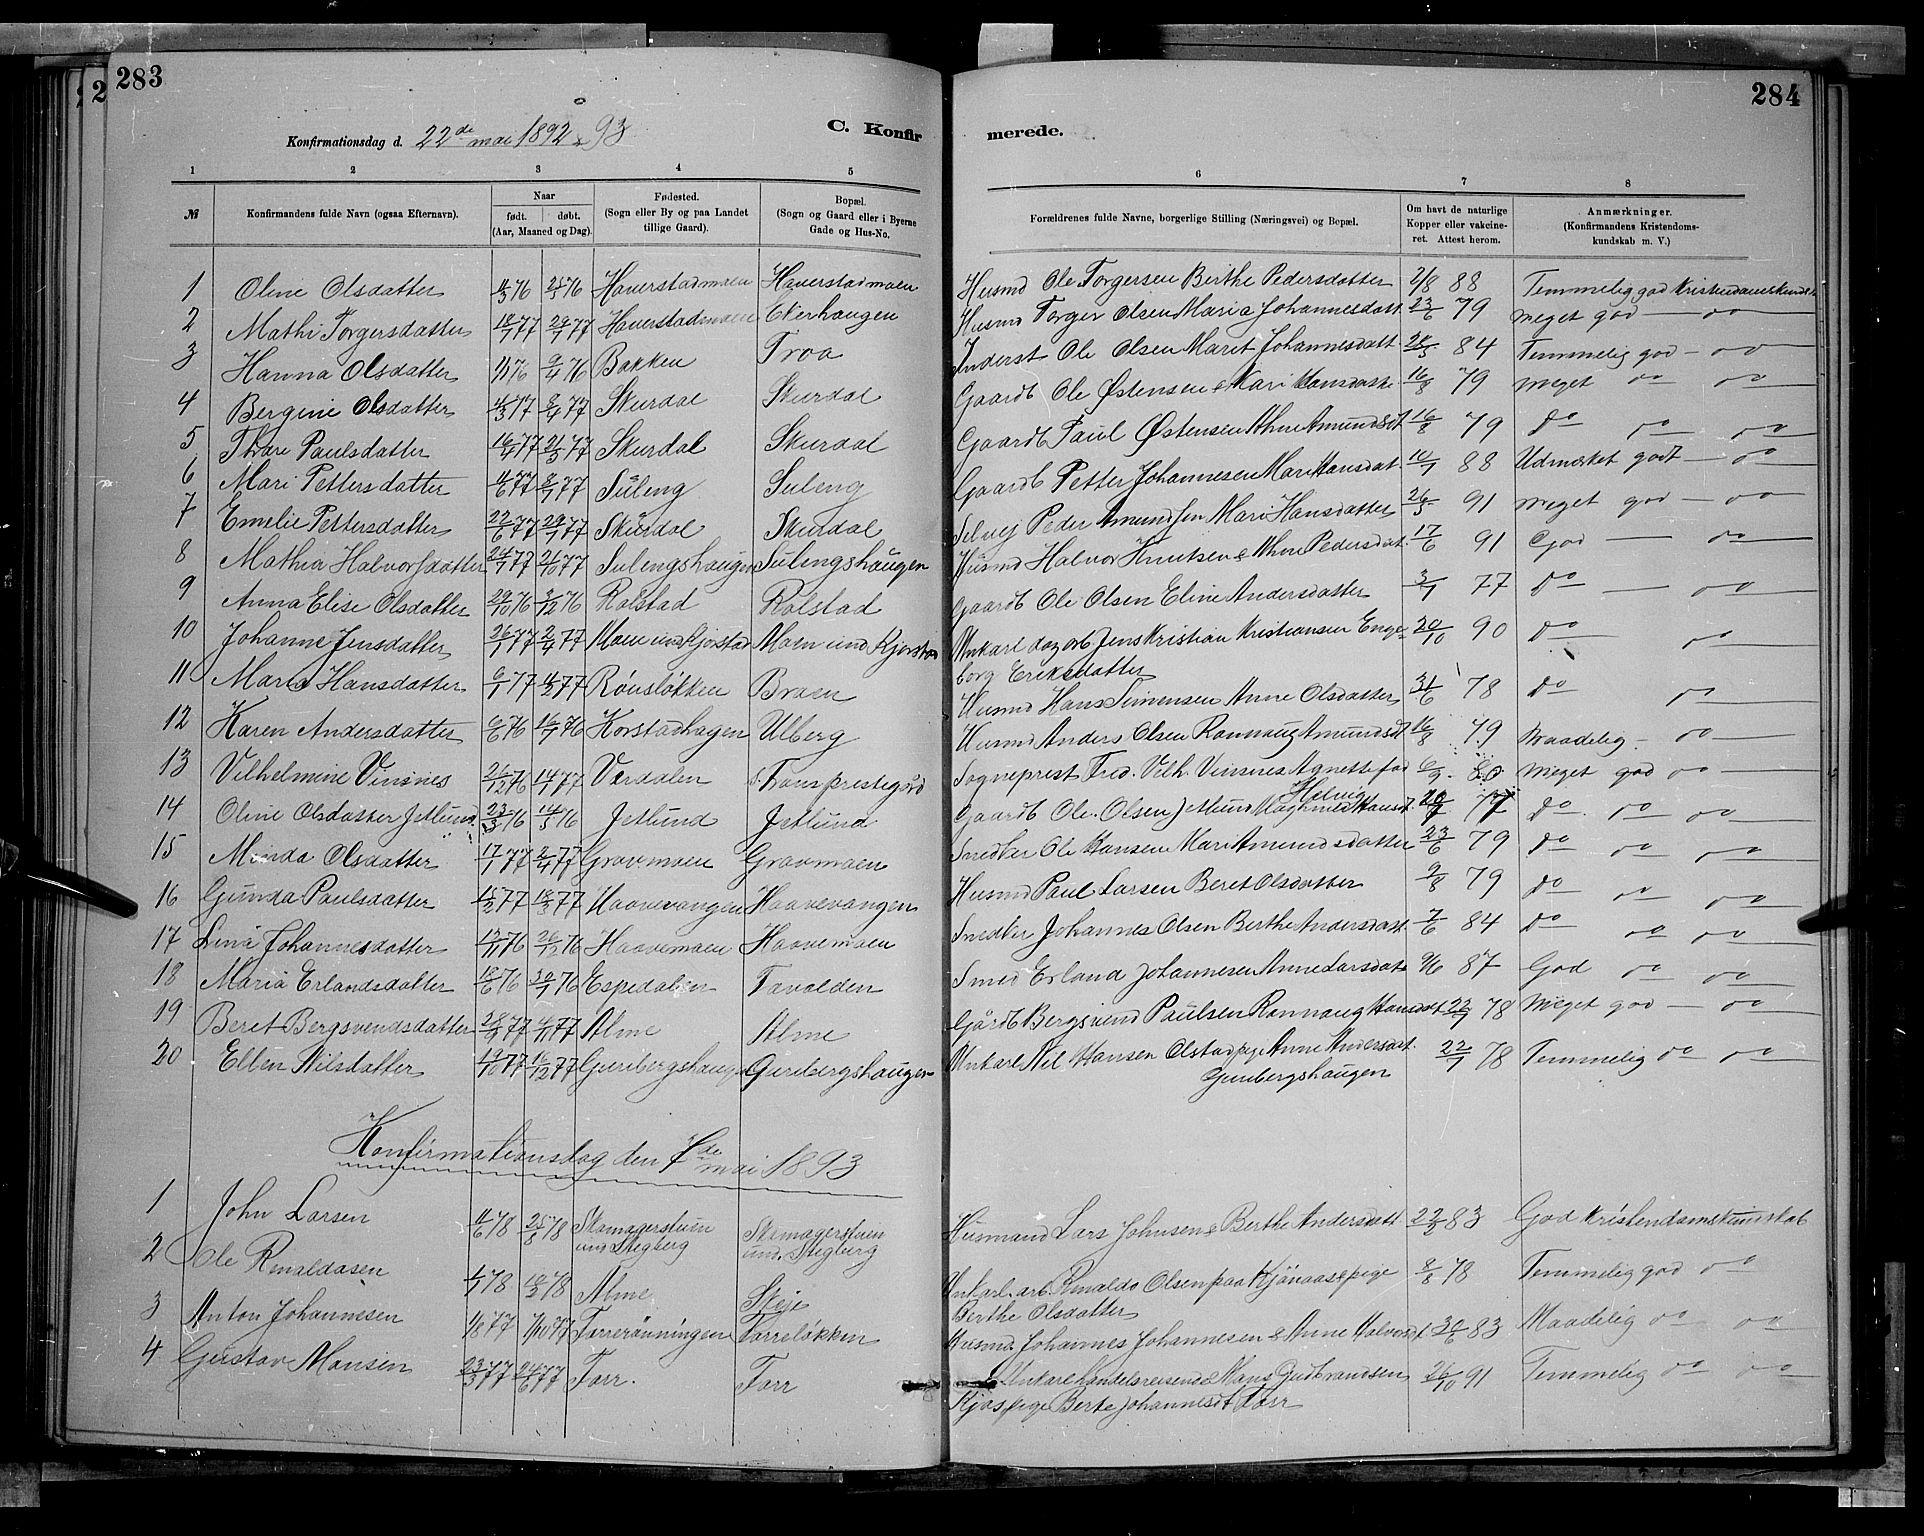 SAH, Sør-Fron prestekontor, H/Ha/Hab/L0003: Klokkerbok nr. 3, 1884-1896, s. 283-284